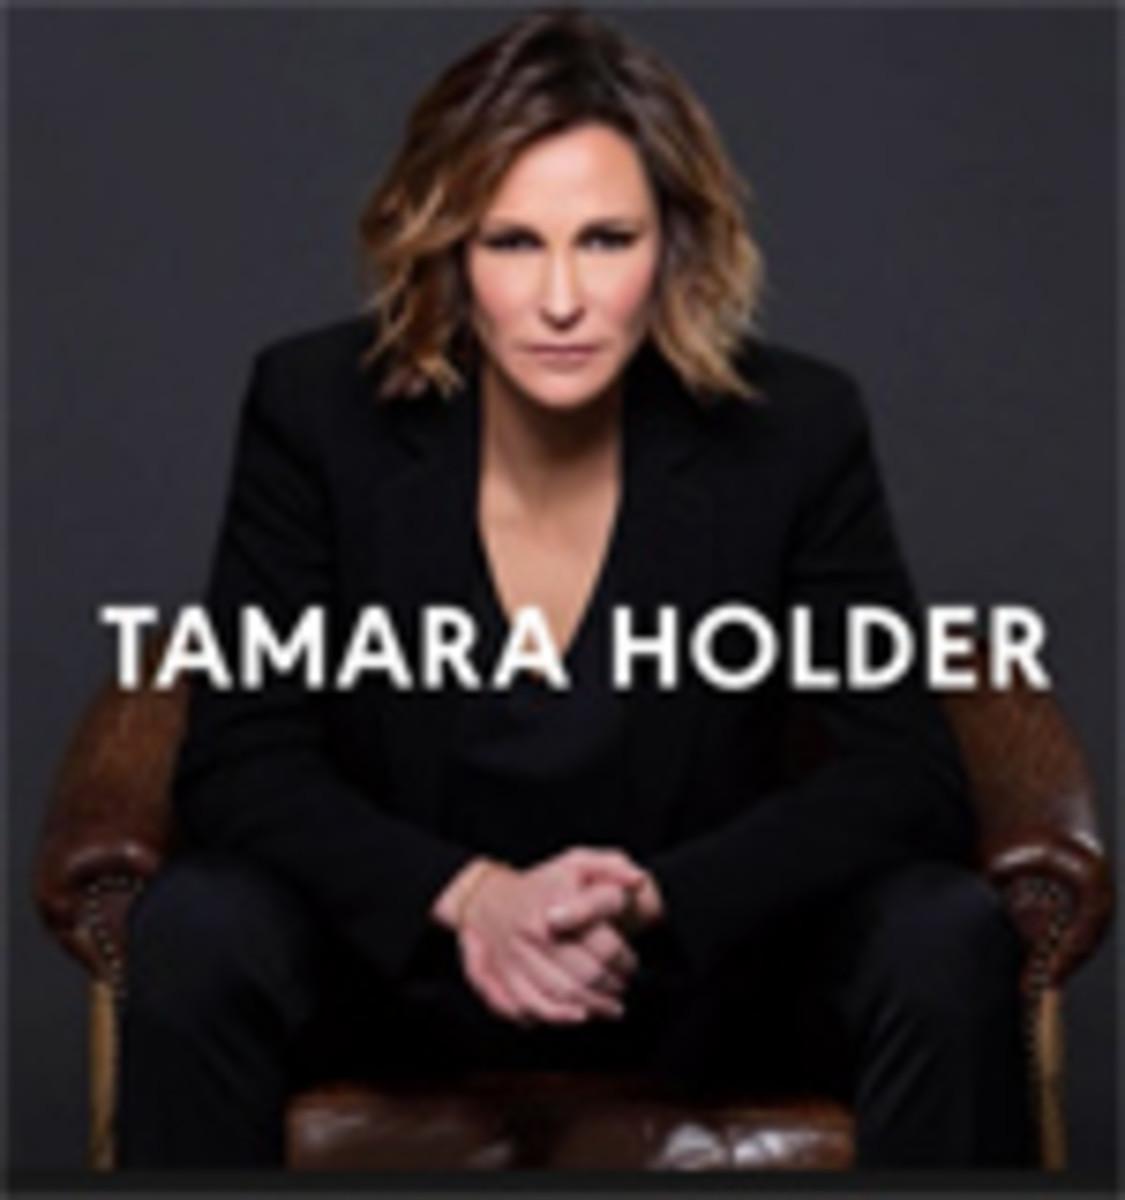 Chicago-based attorney Tamara Holder.